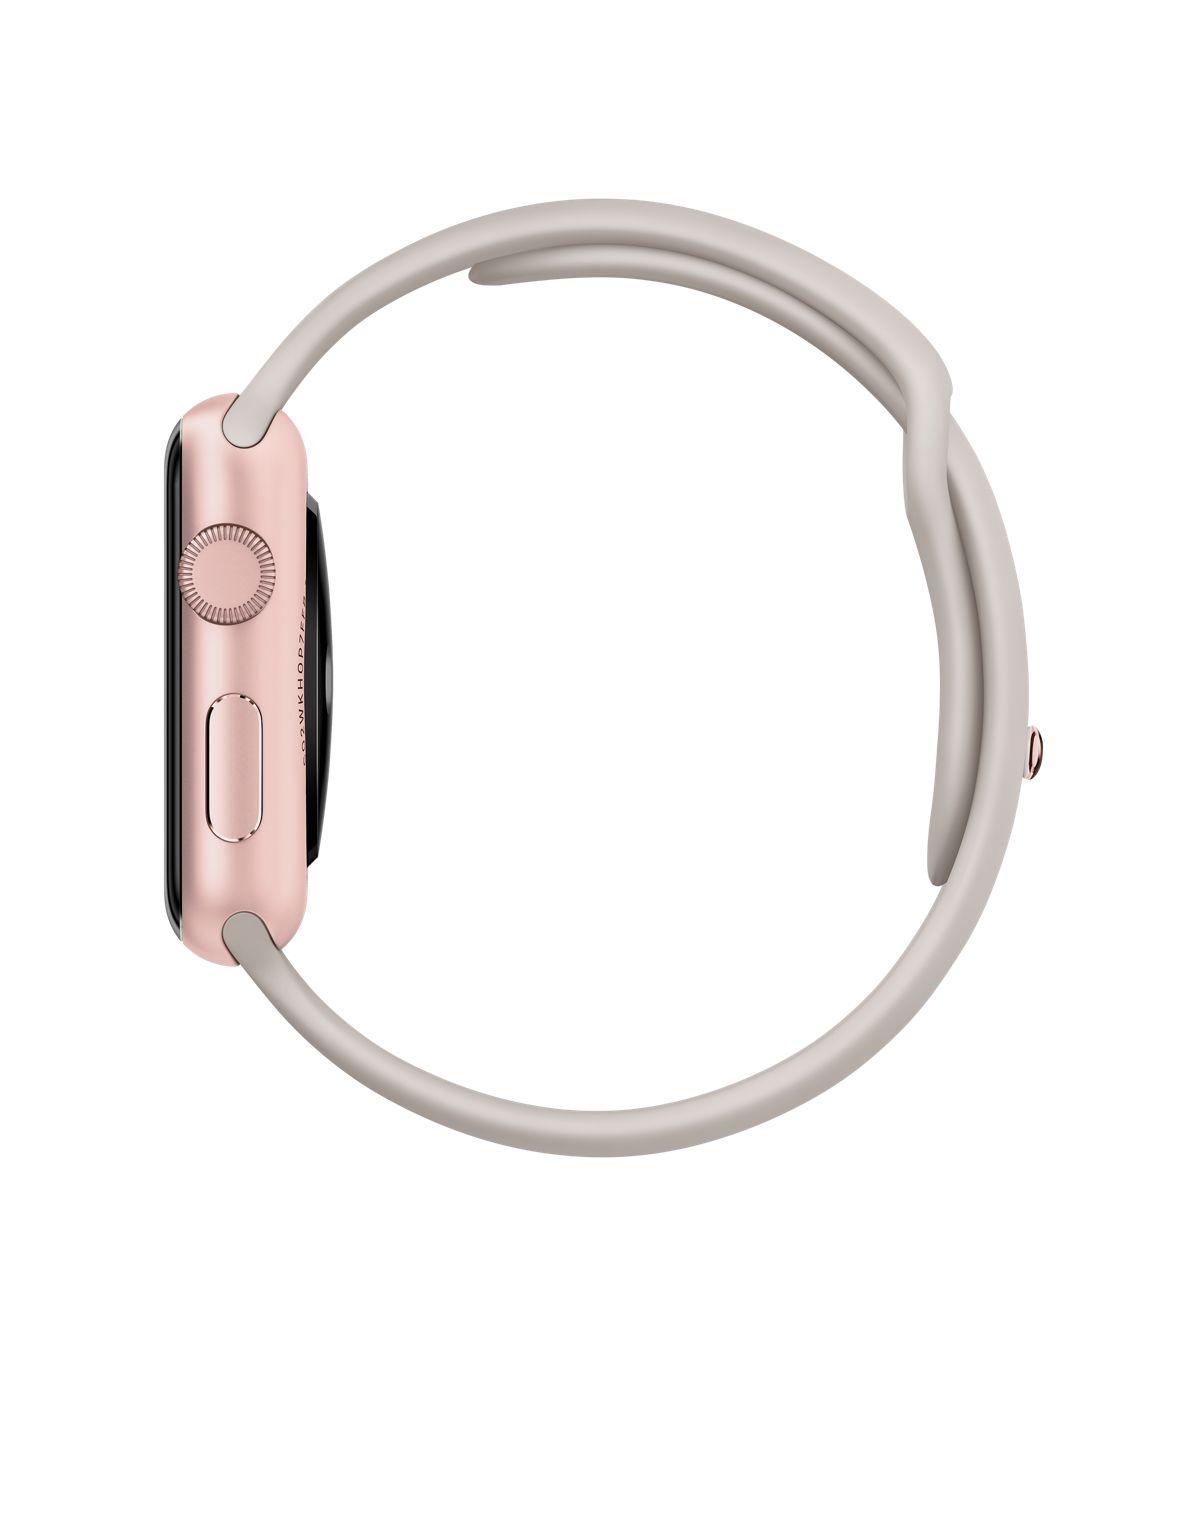 Apple Watch Sport 42mm Rose Gold with Stone Sport Band (MLC62), Эппл Вотч Спорт 42мм Розовое золото с спортивным ремешком (MLC62)